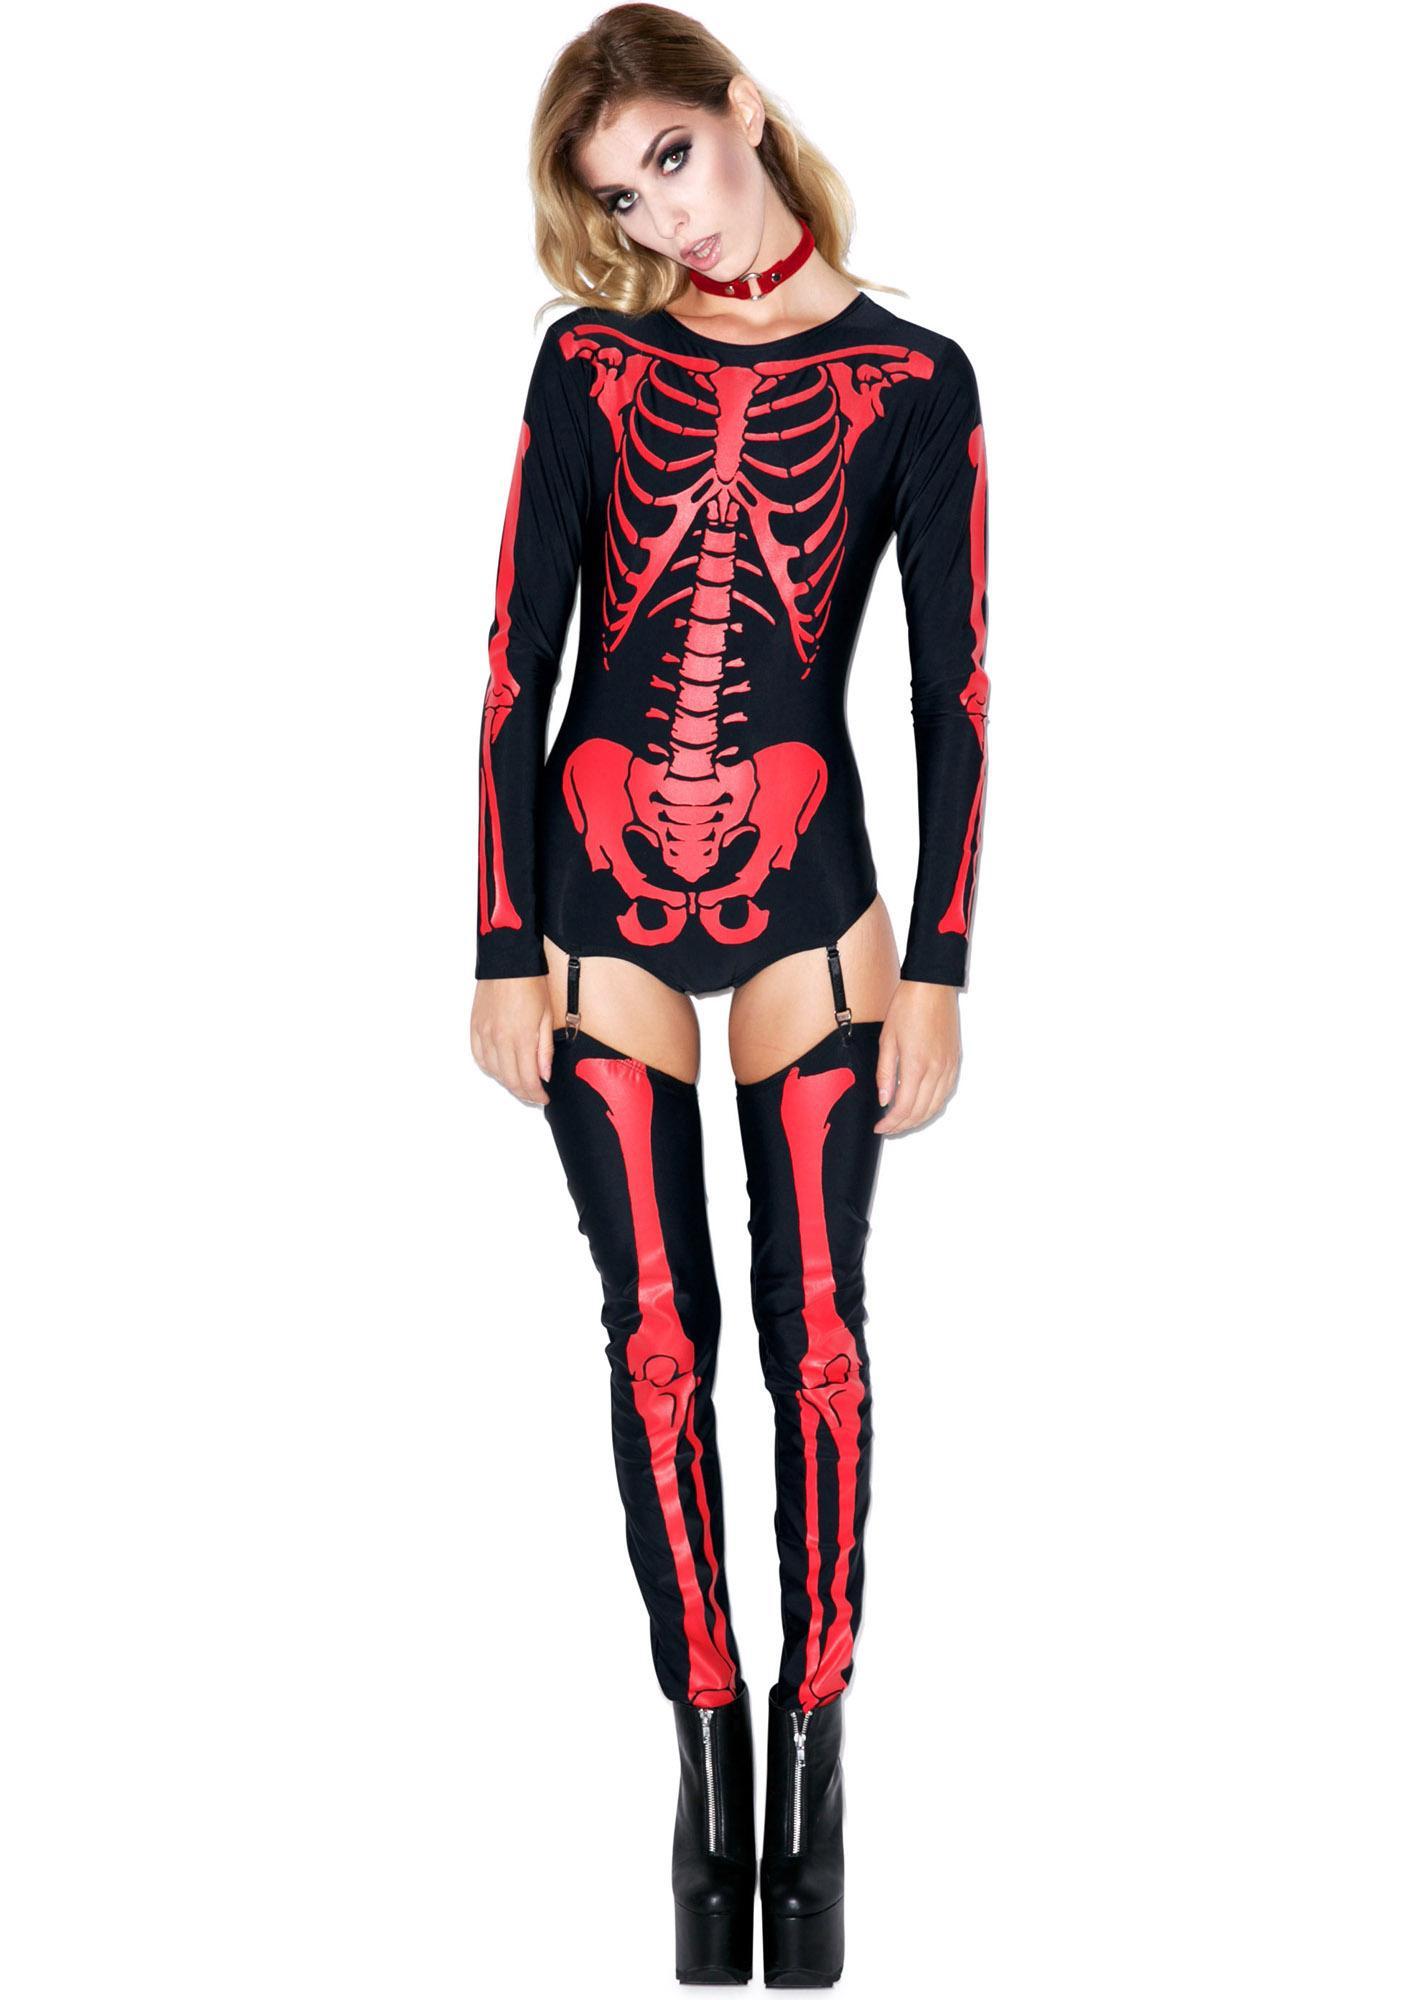 Fiery Frame Skeleton Costume